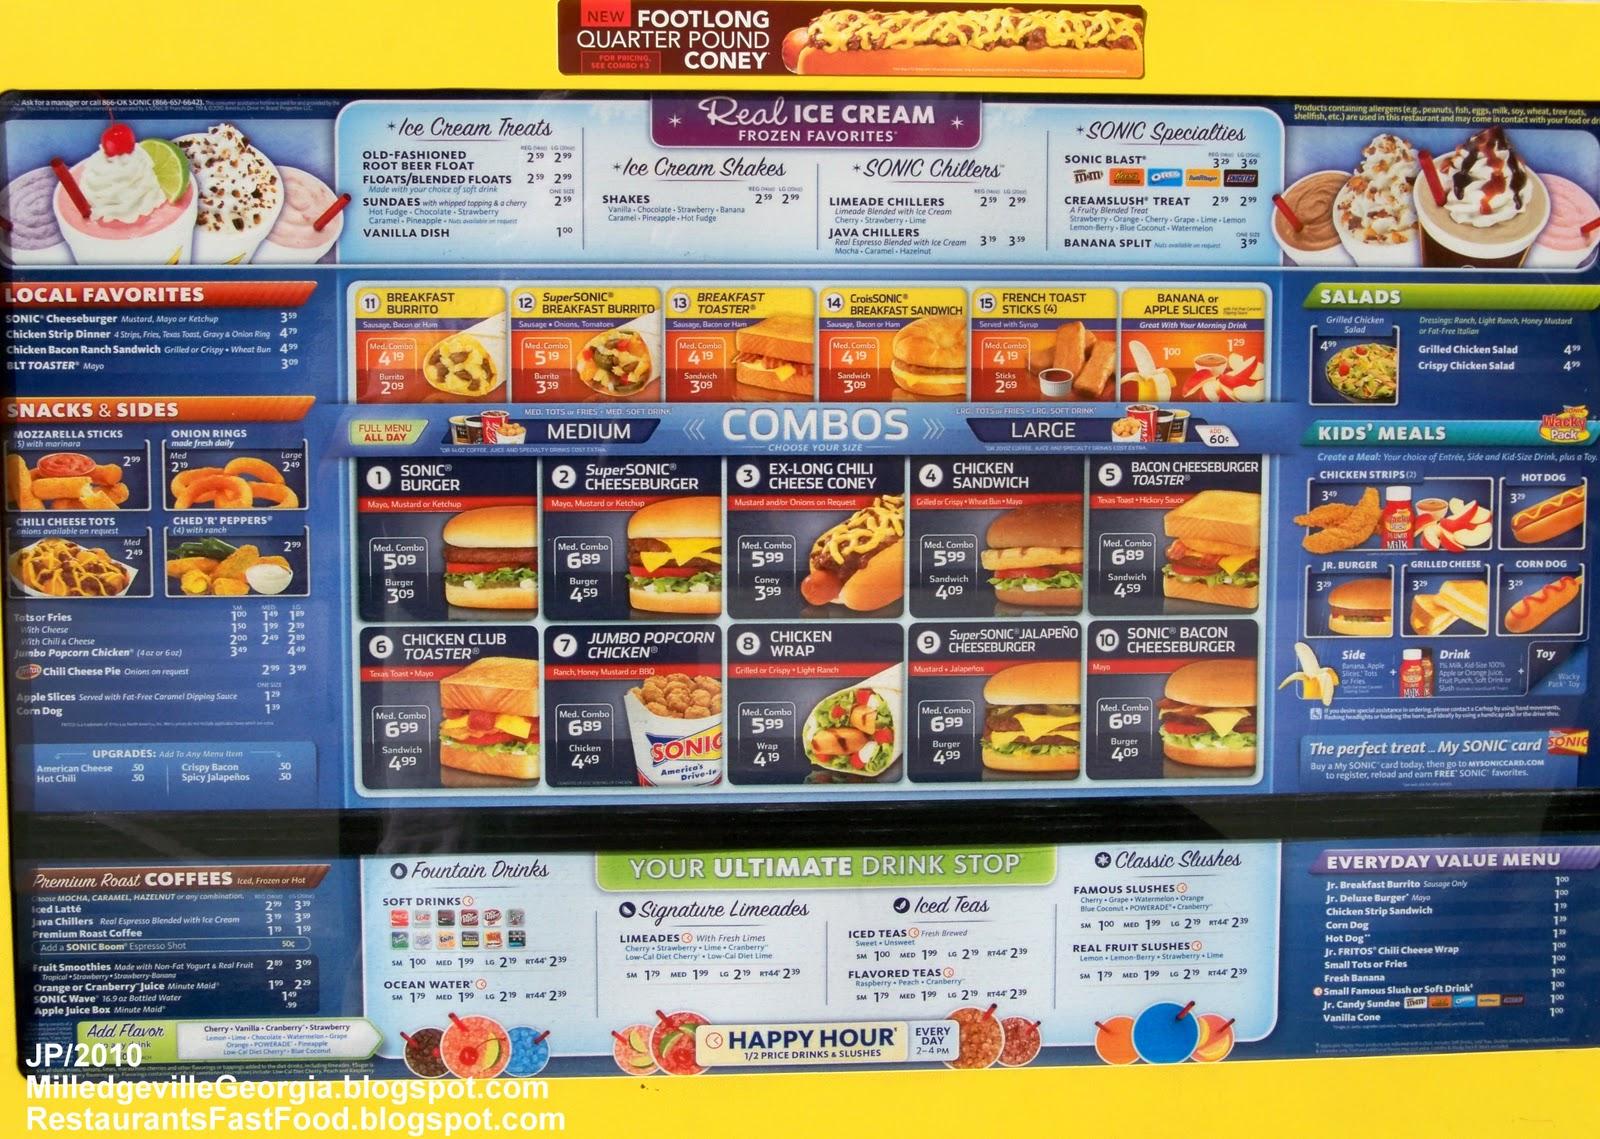 Milledgeville Fast Food